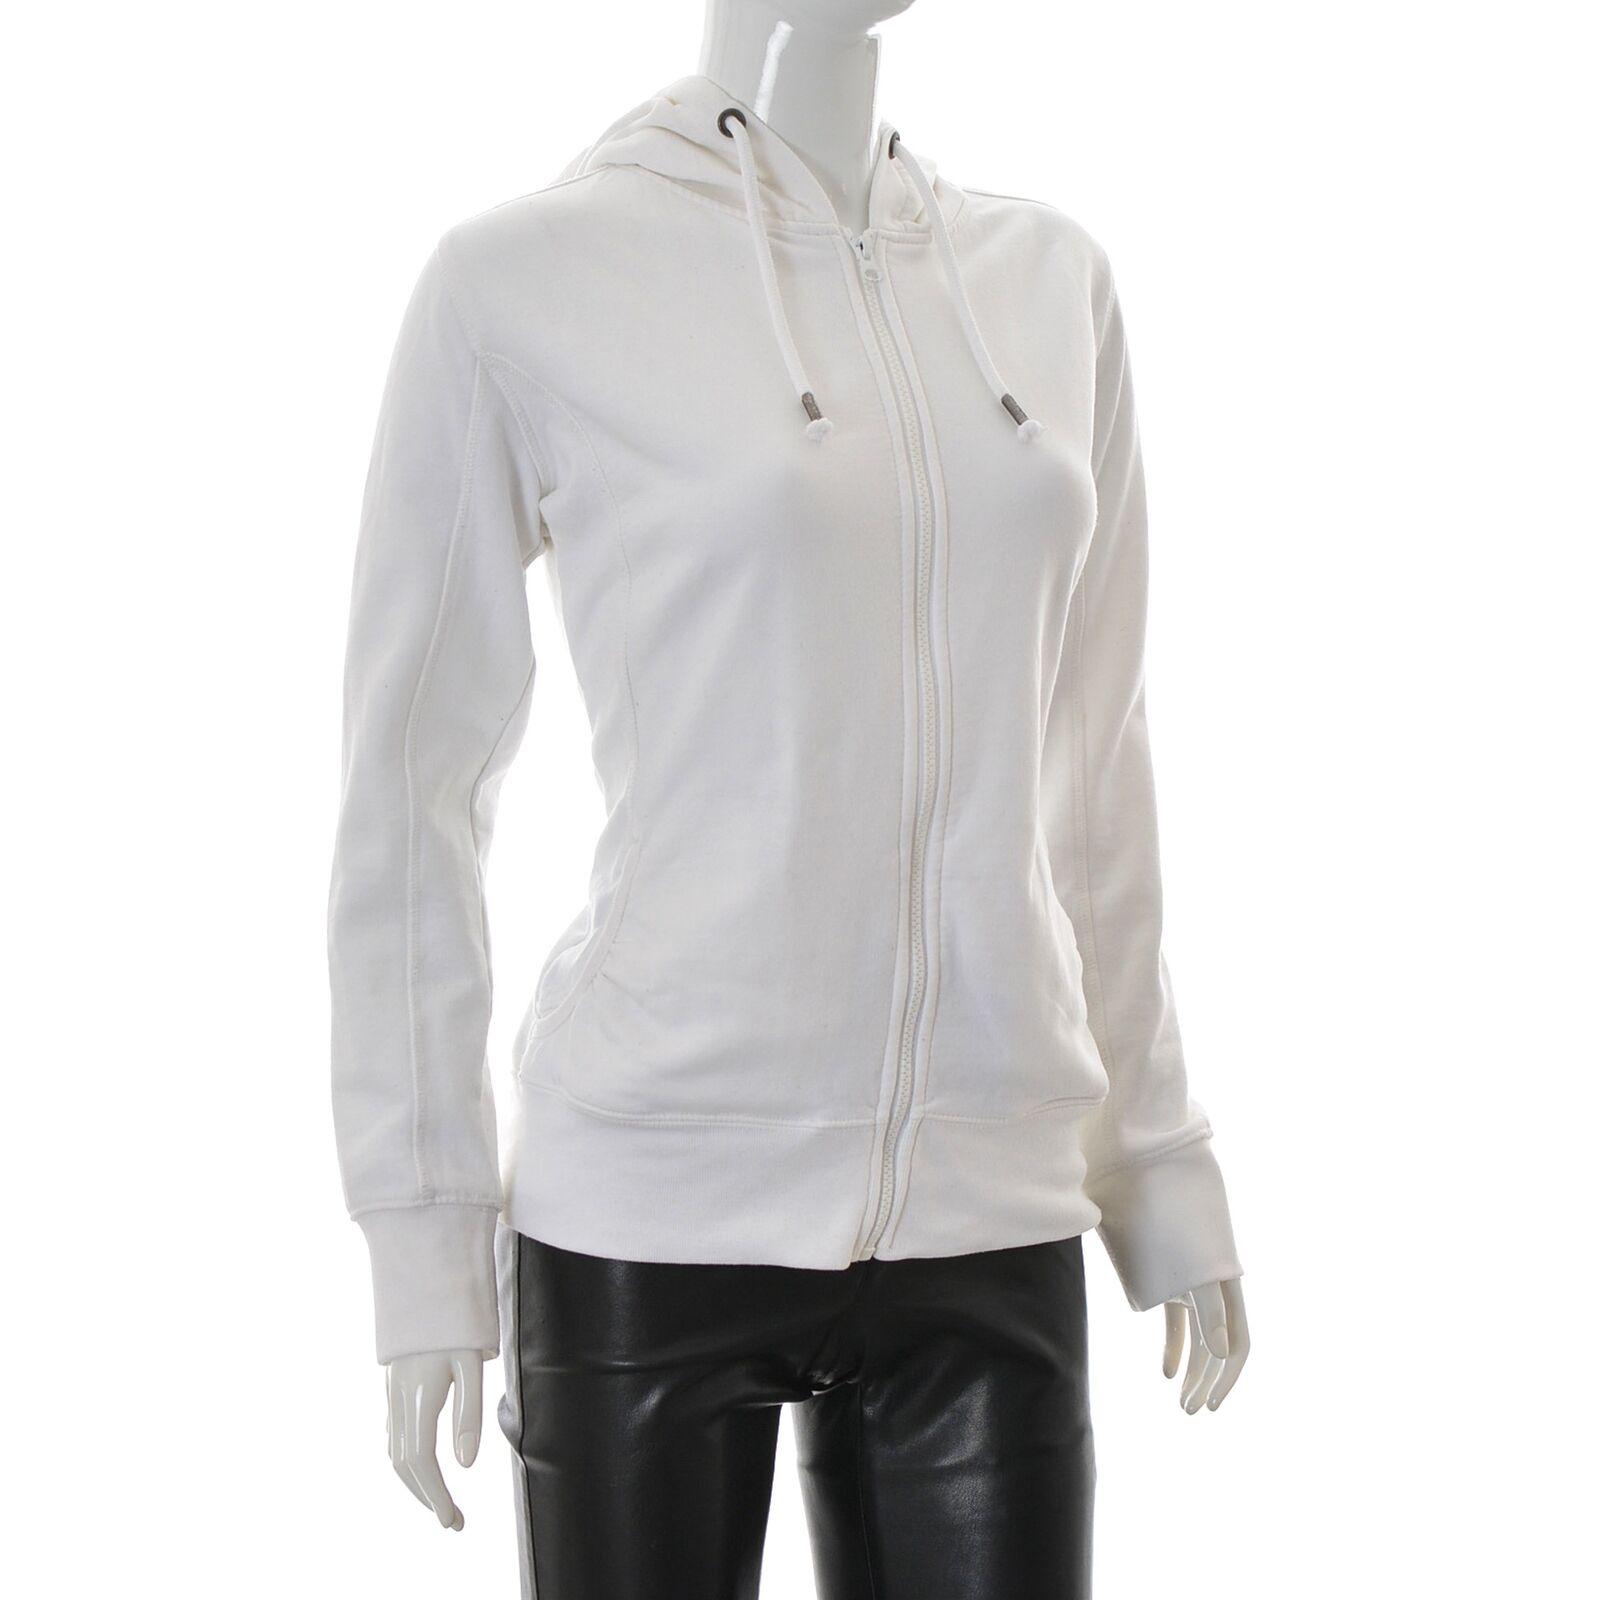 Engelbert Strauss for Women's jumper Full Zip Hoodie Sweatshirt Medium M White